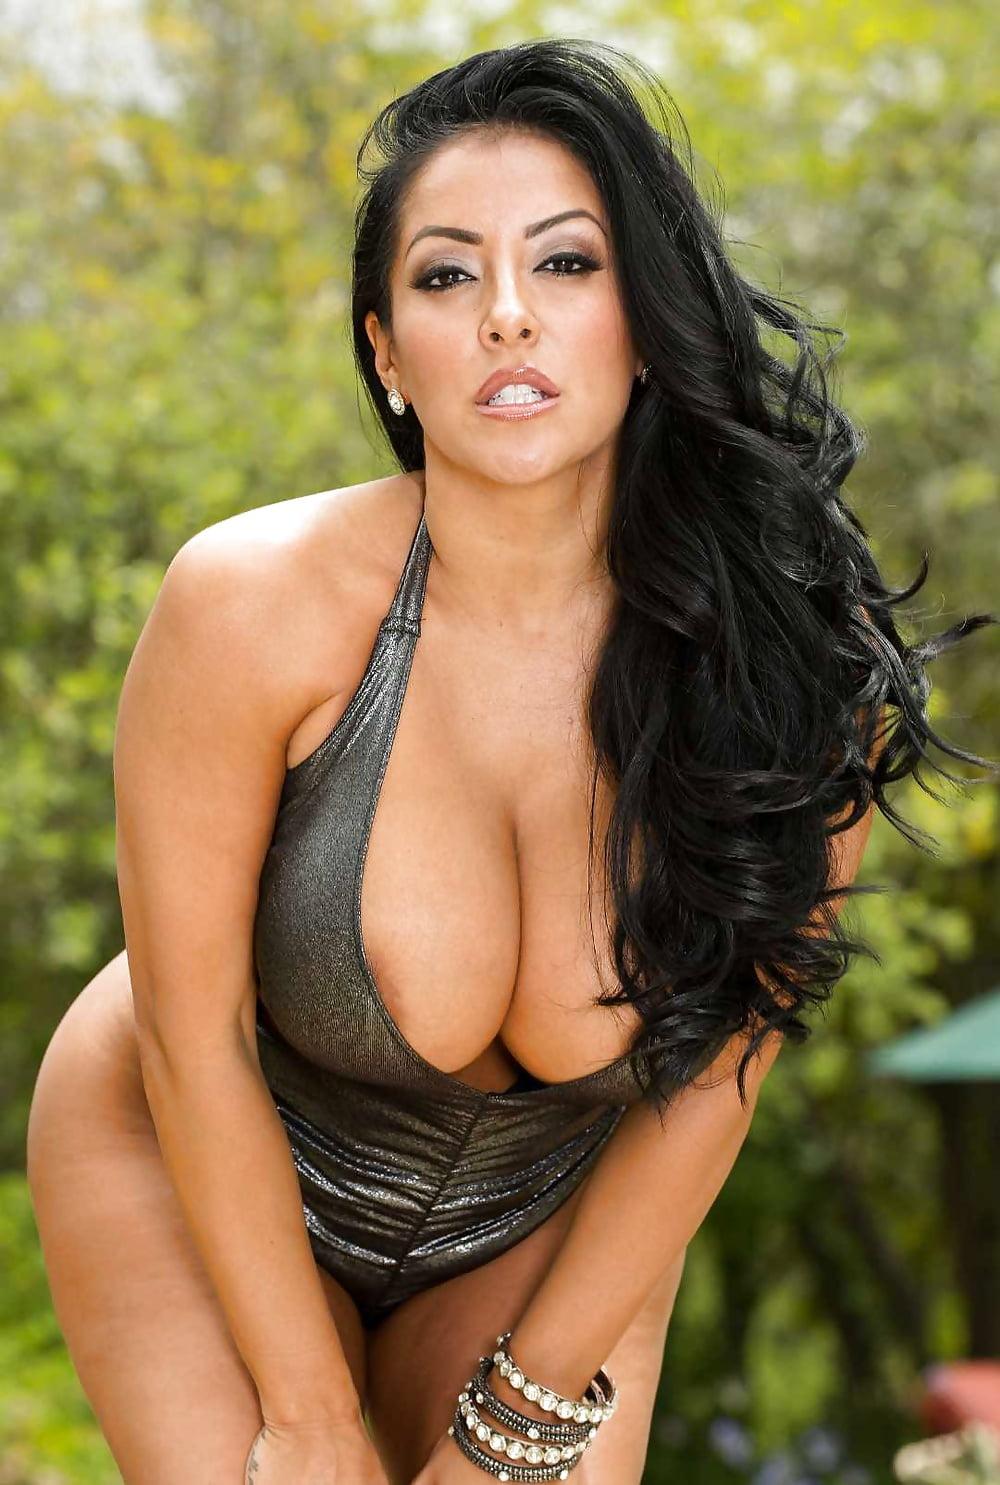 Brunette Pornstar Kiara Mia Gets Her Pussy Nailed Photos